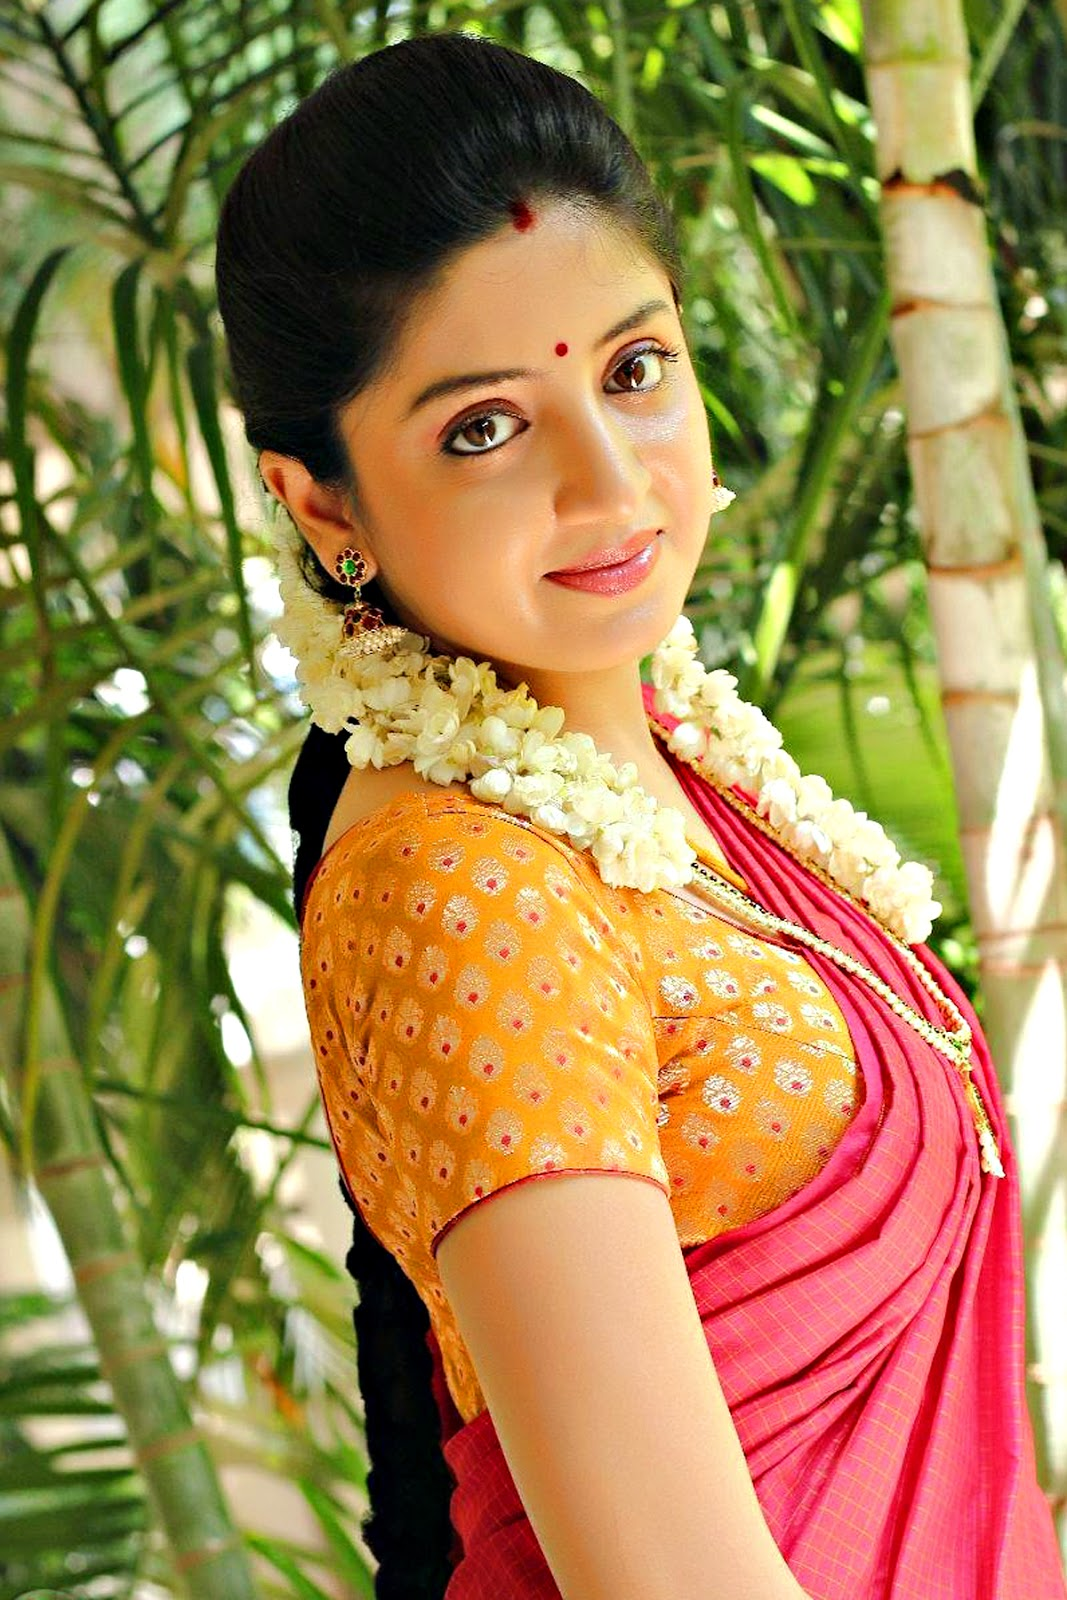 Telugu Actress In Saree New Hd Photo Shoot Wallpaper Free